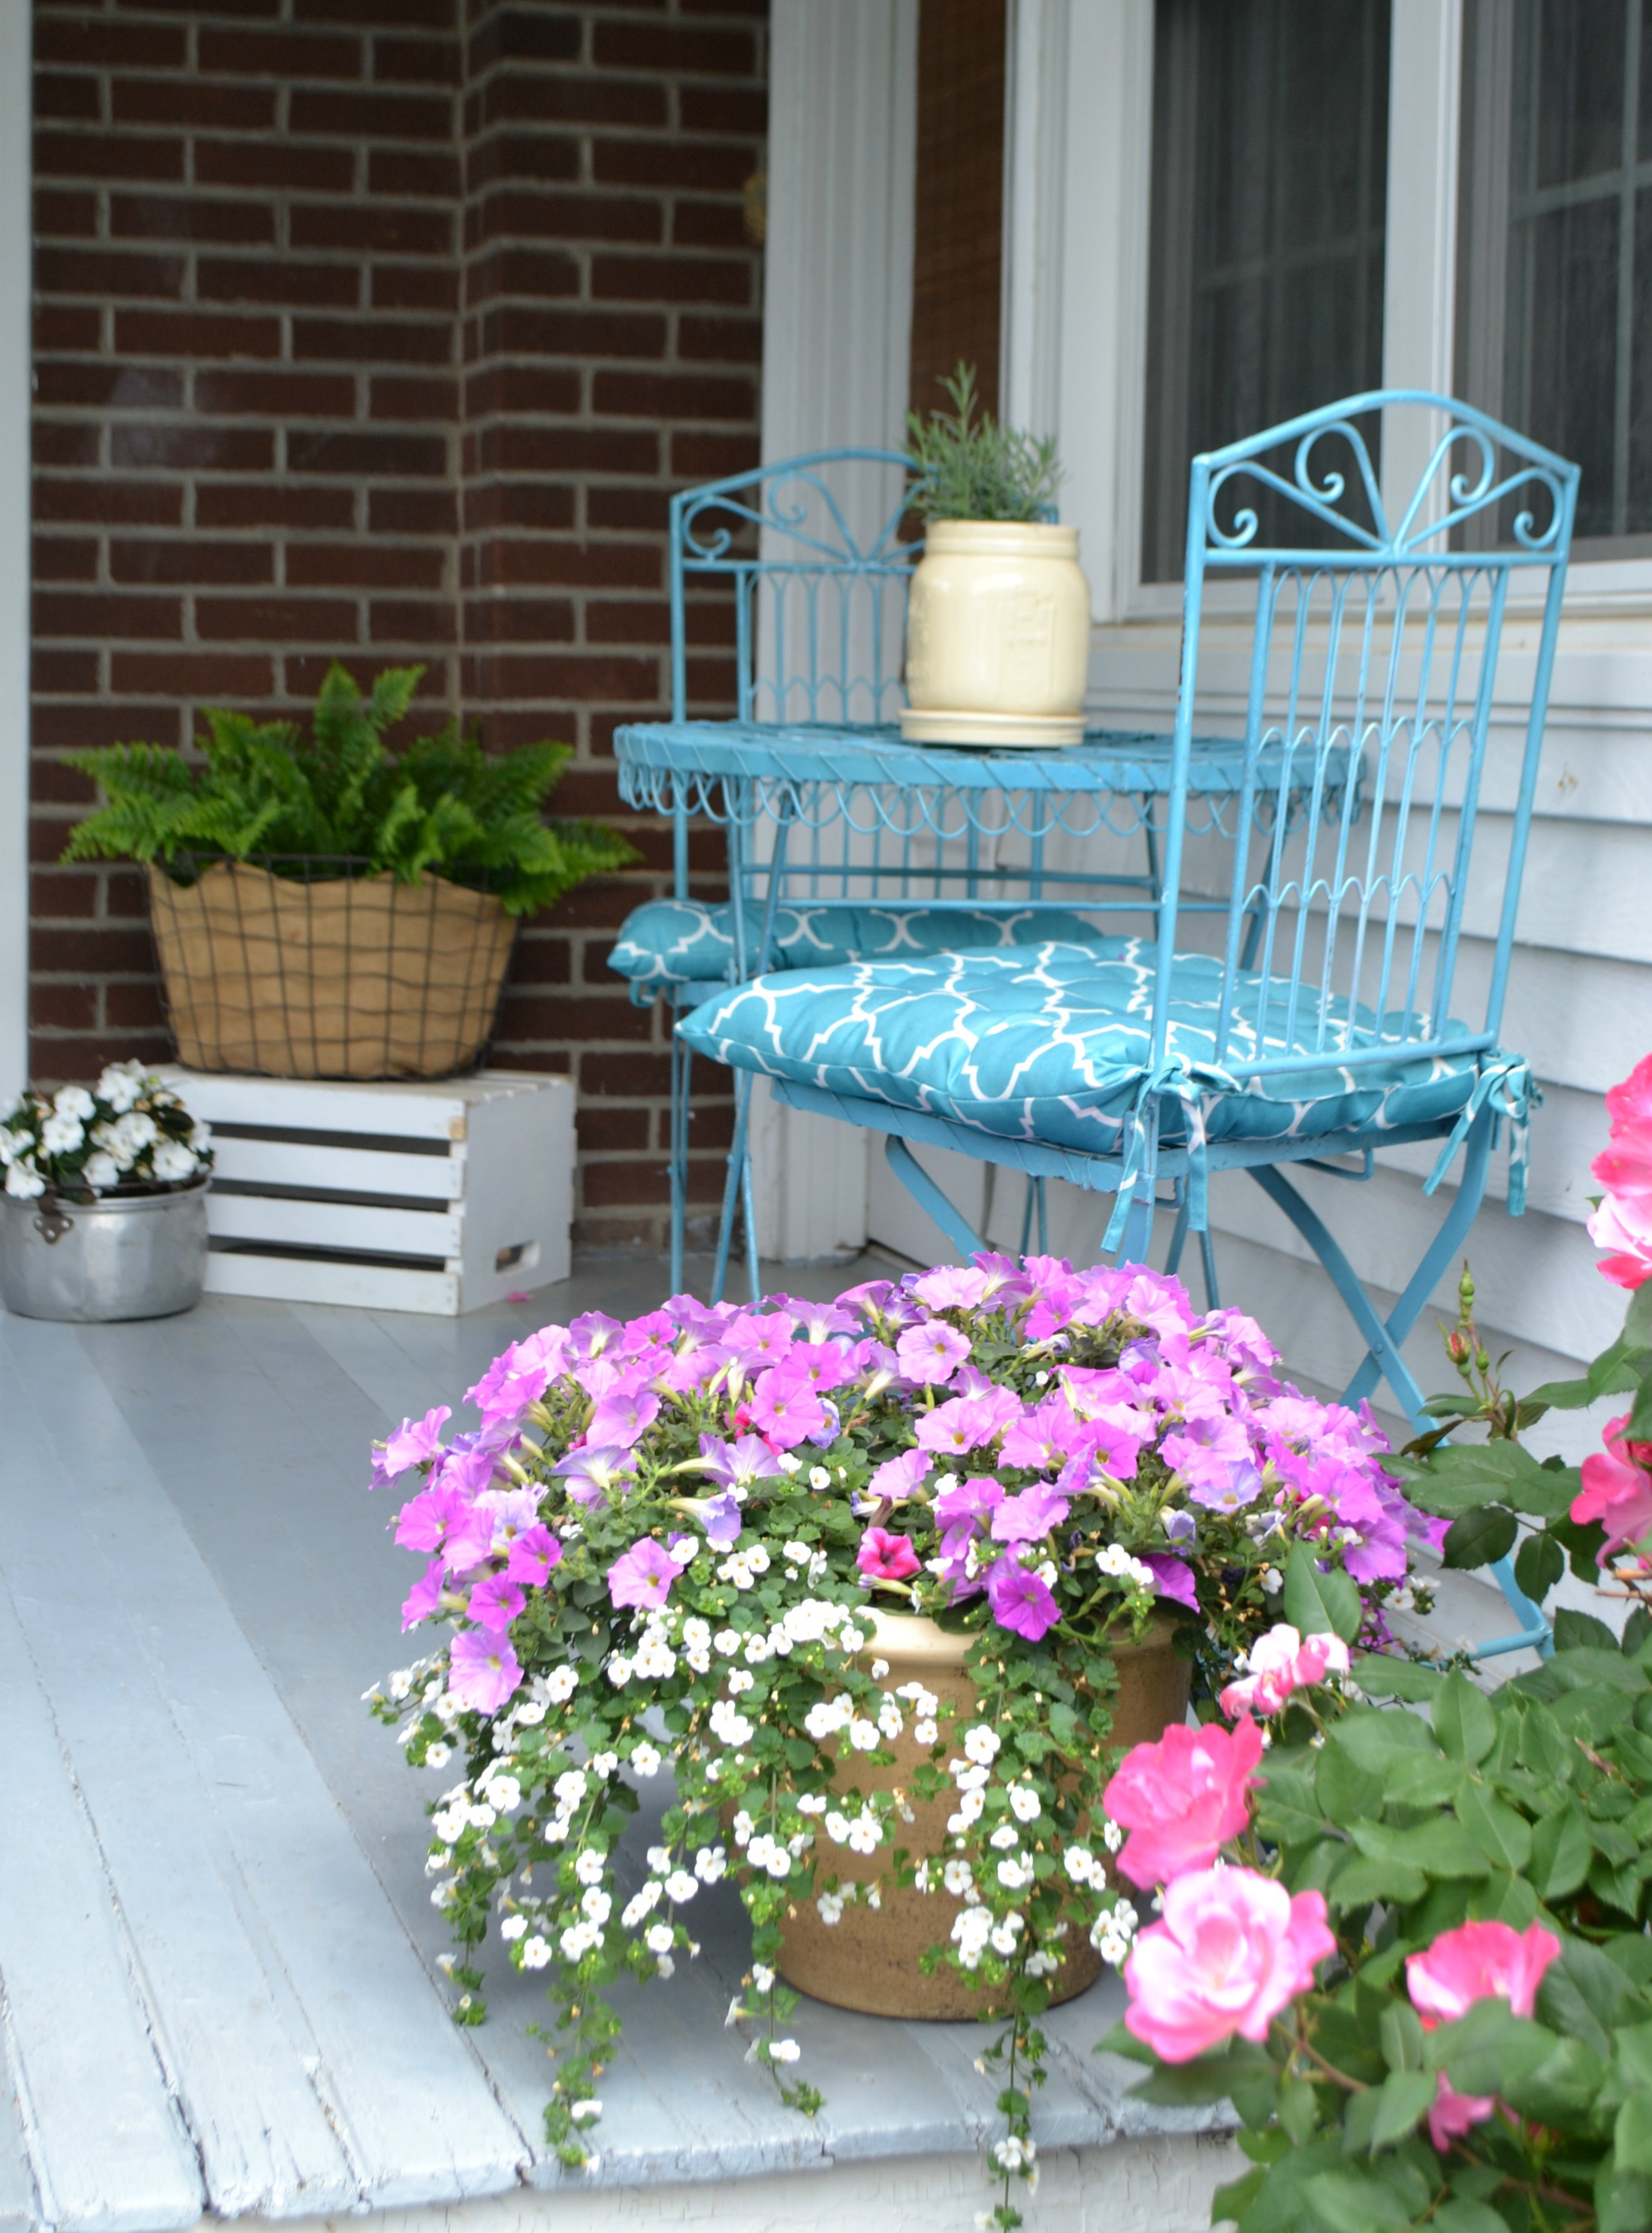 Spring aimee weaver designs llc for Aimee weaver blogspot